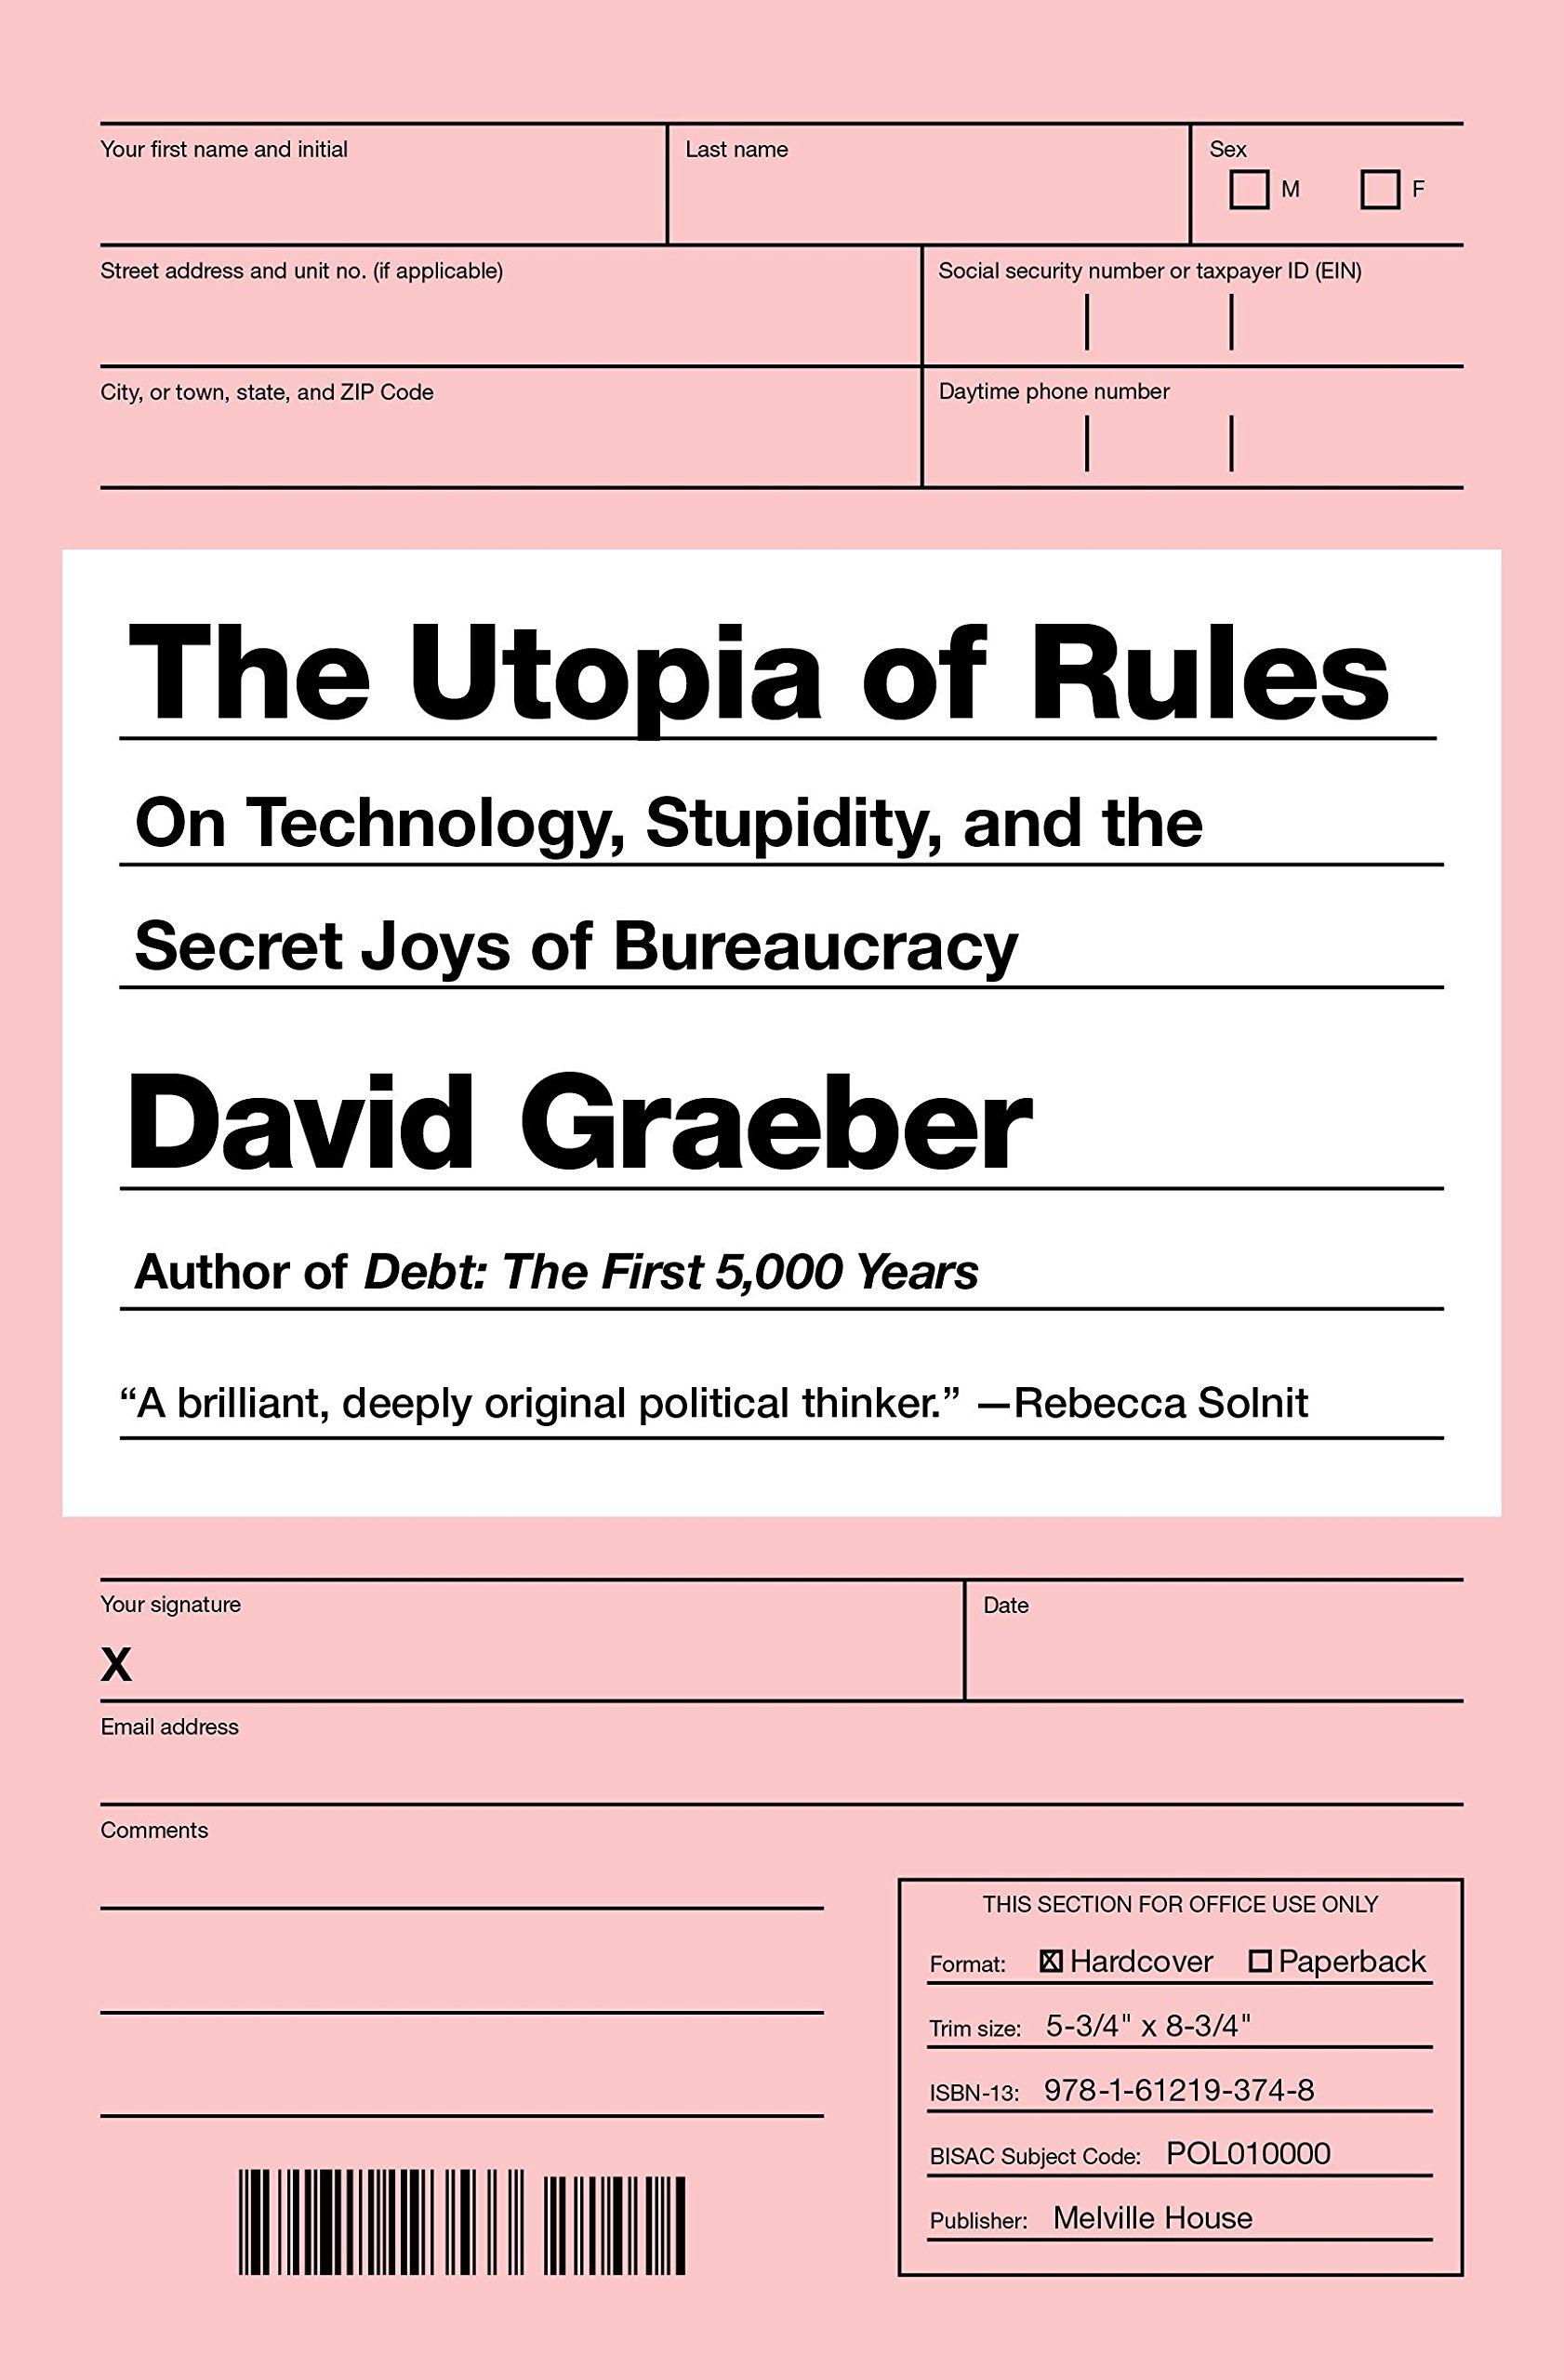 « The Utopia of Rules », de David Graeber